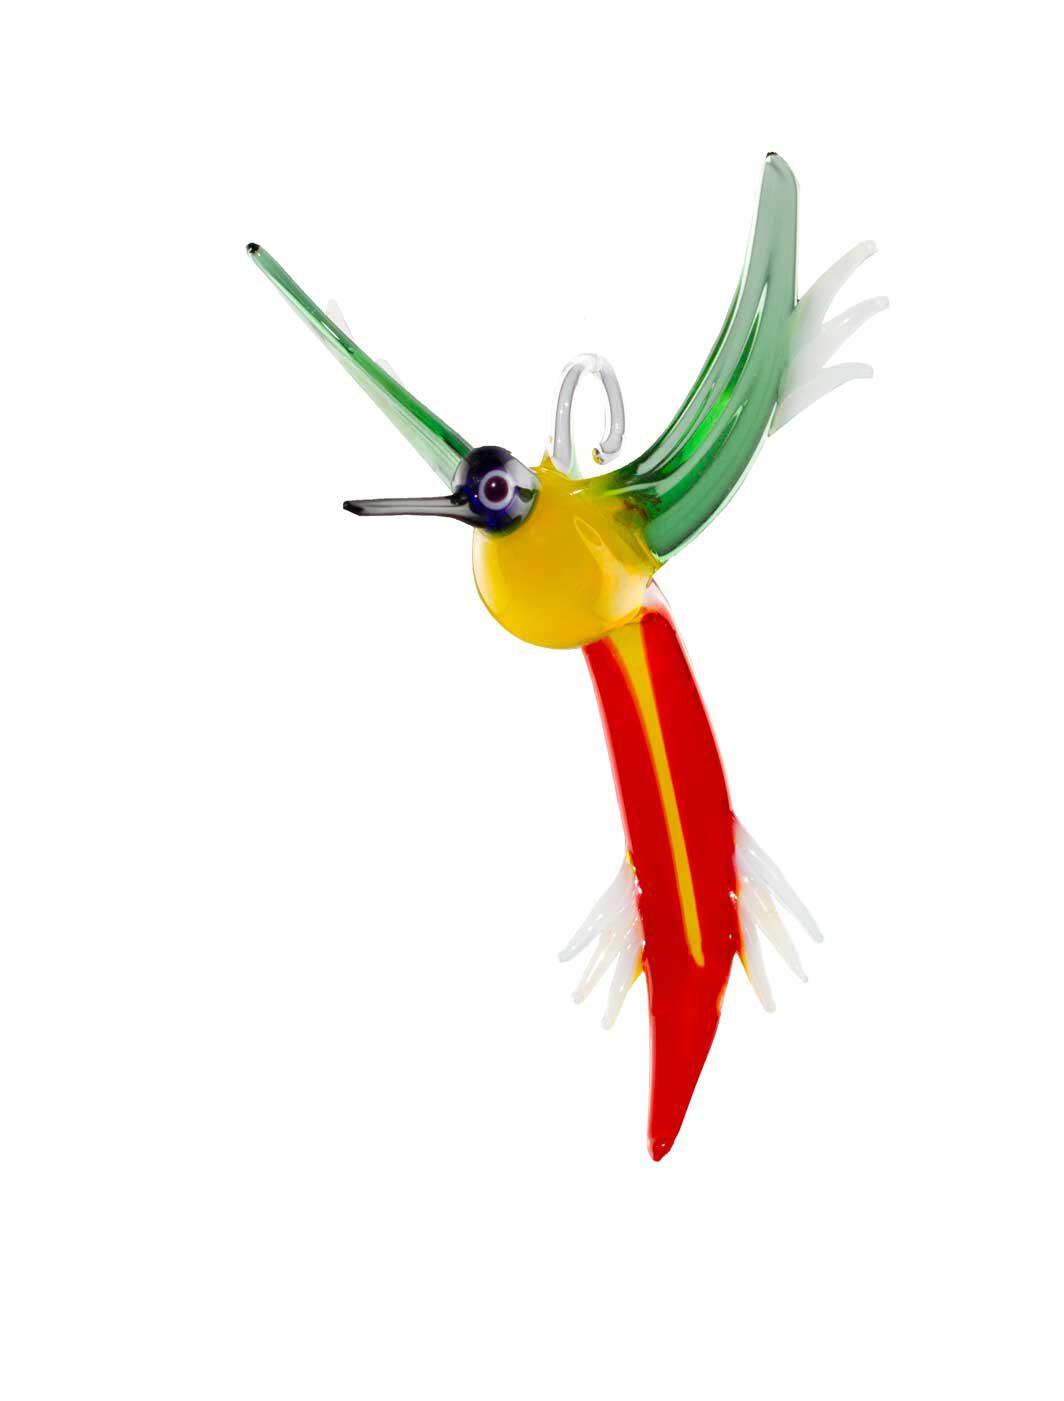 Glasfigur Kolibri hängend gelb rot grün blau